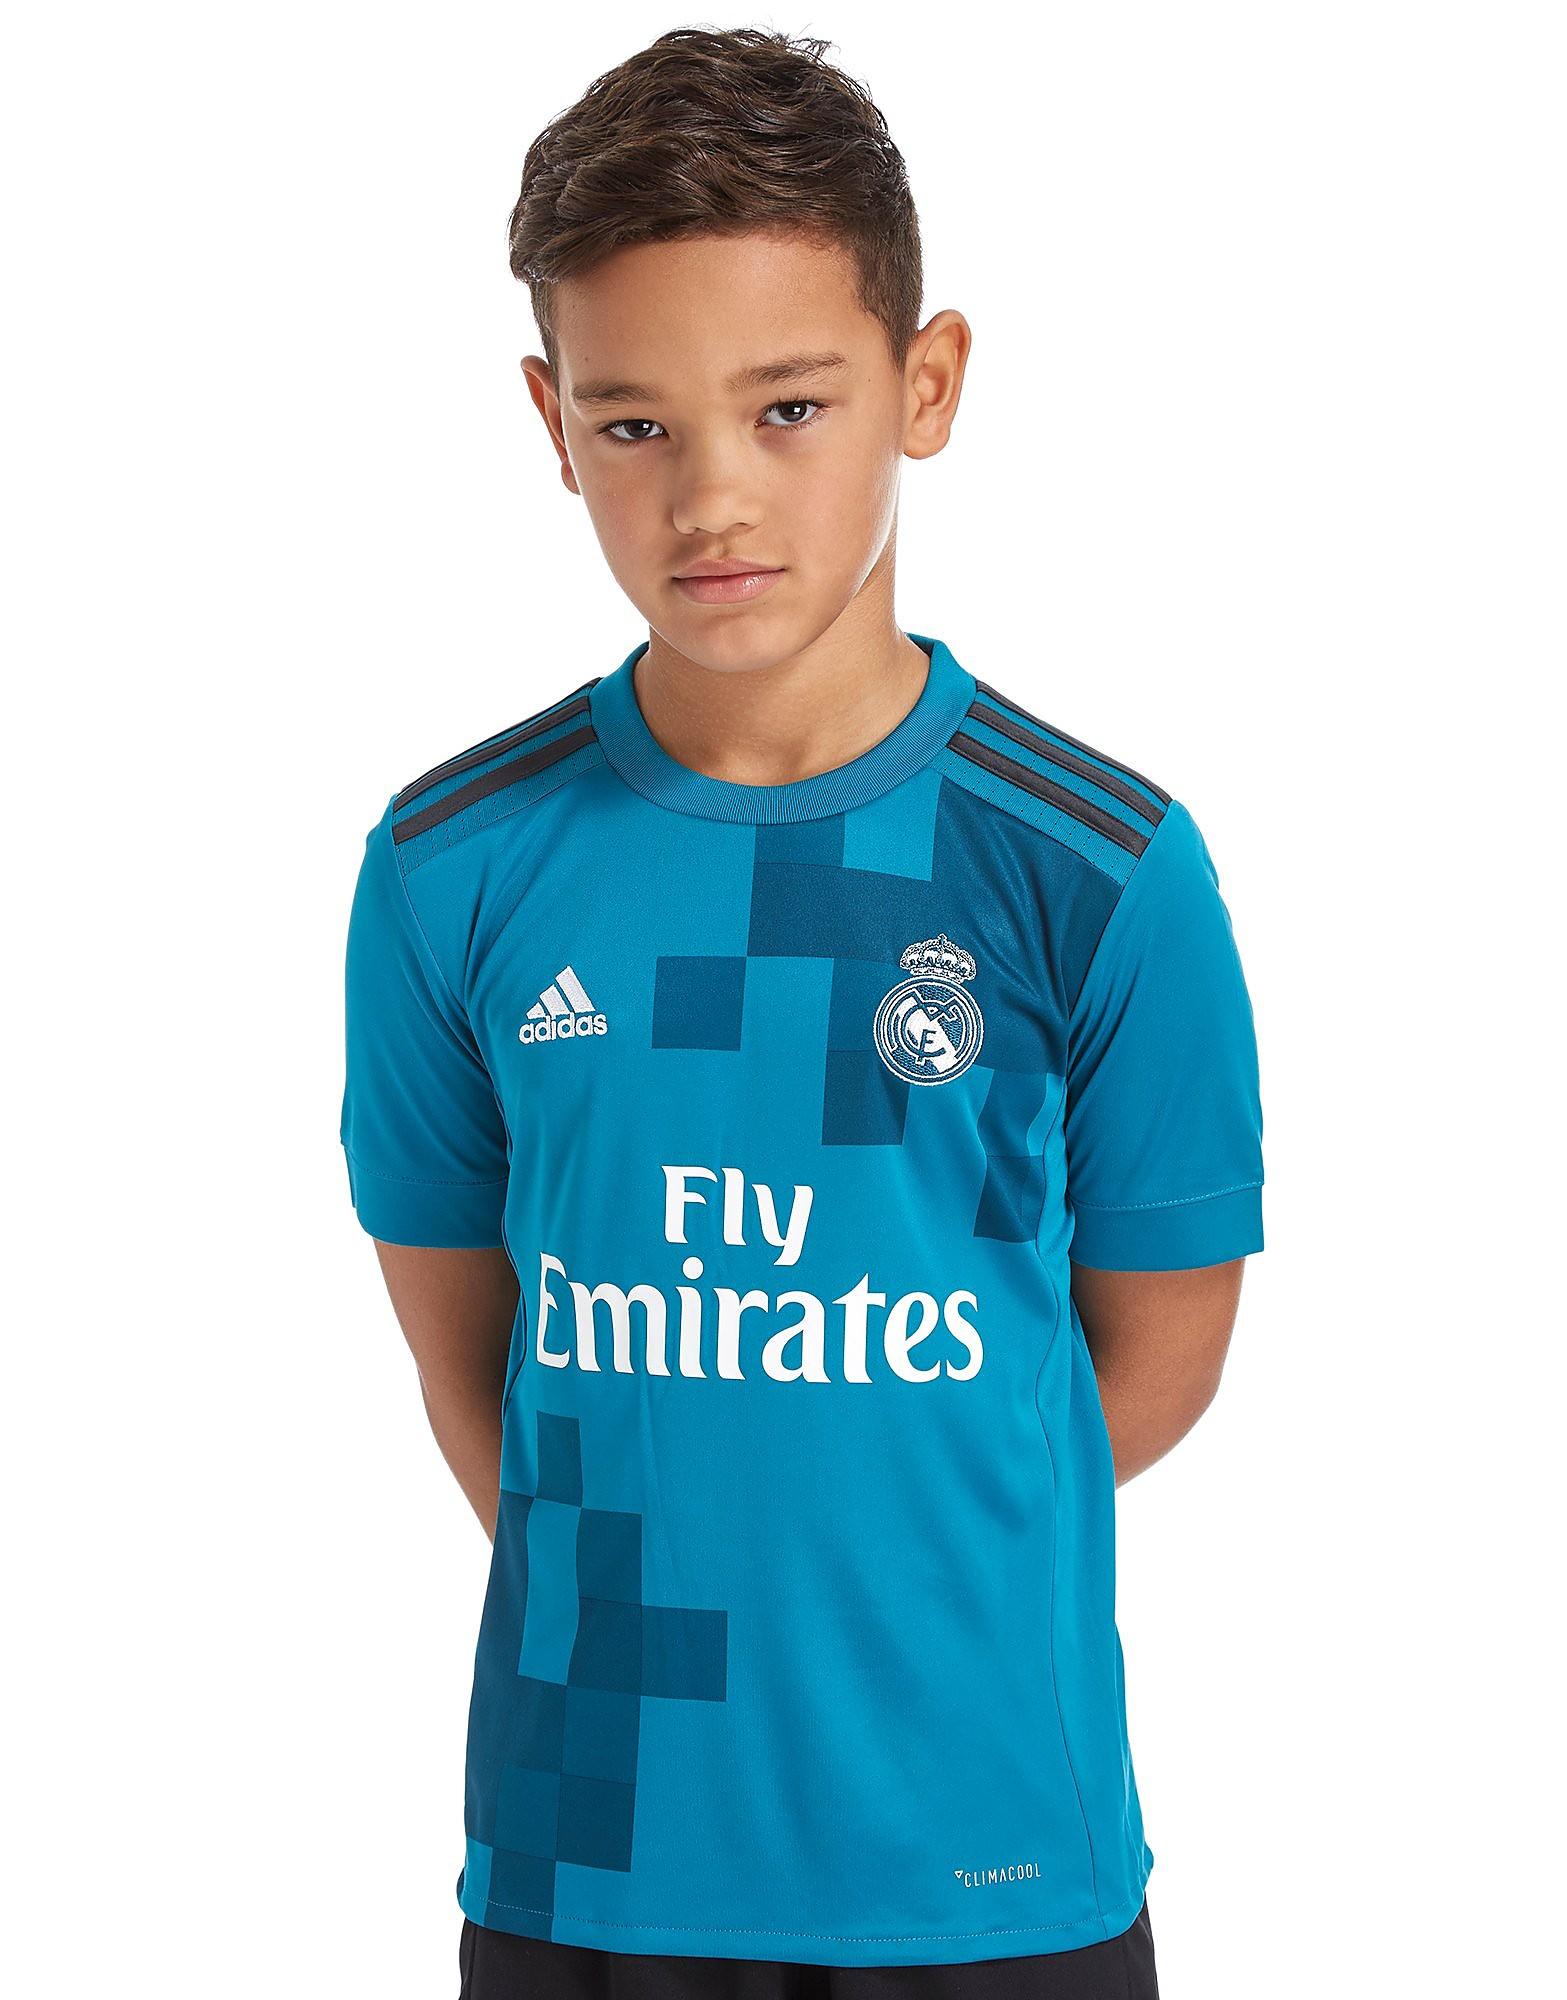 adidas Real Madrid 2017/18 Third Shirt Junior